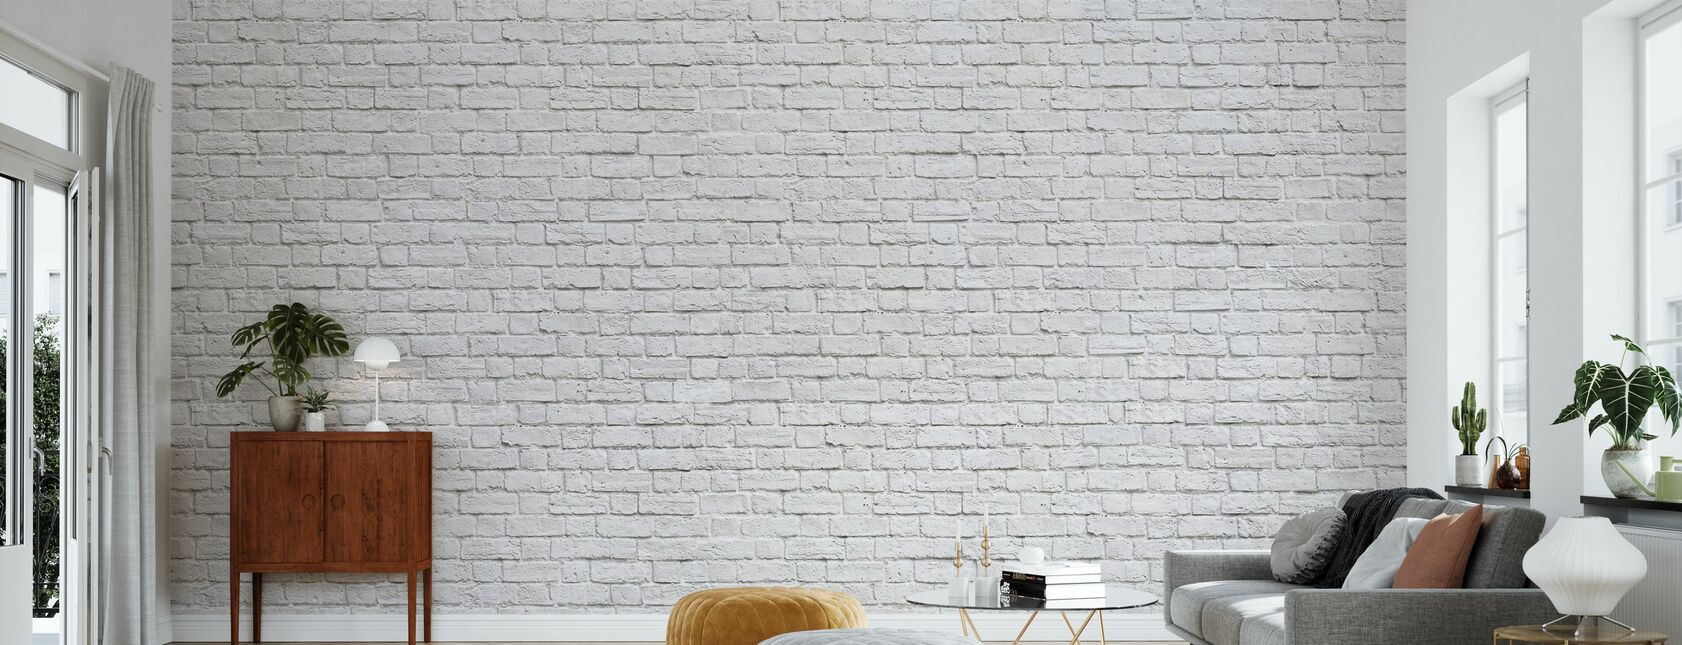 Brick Wall - White - Wallpaper - Living Room